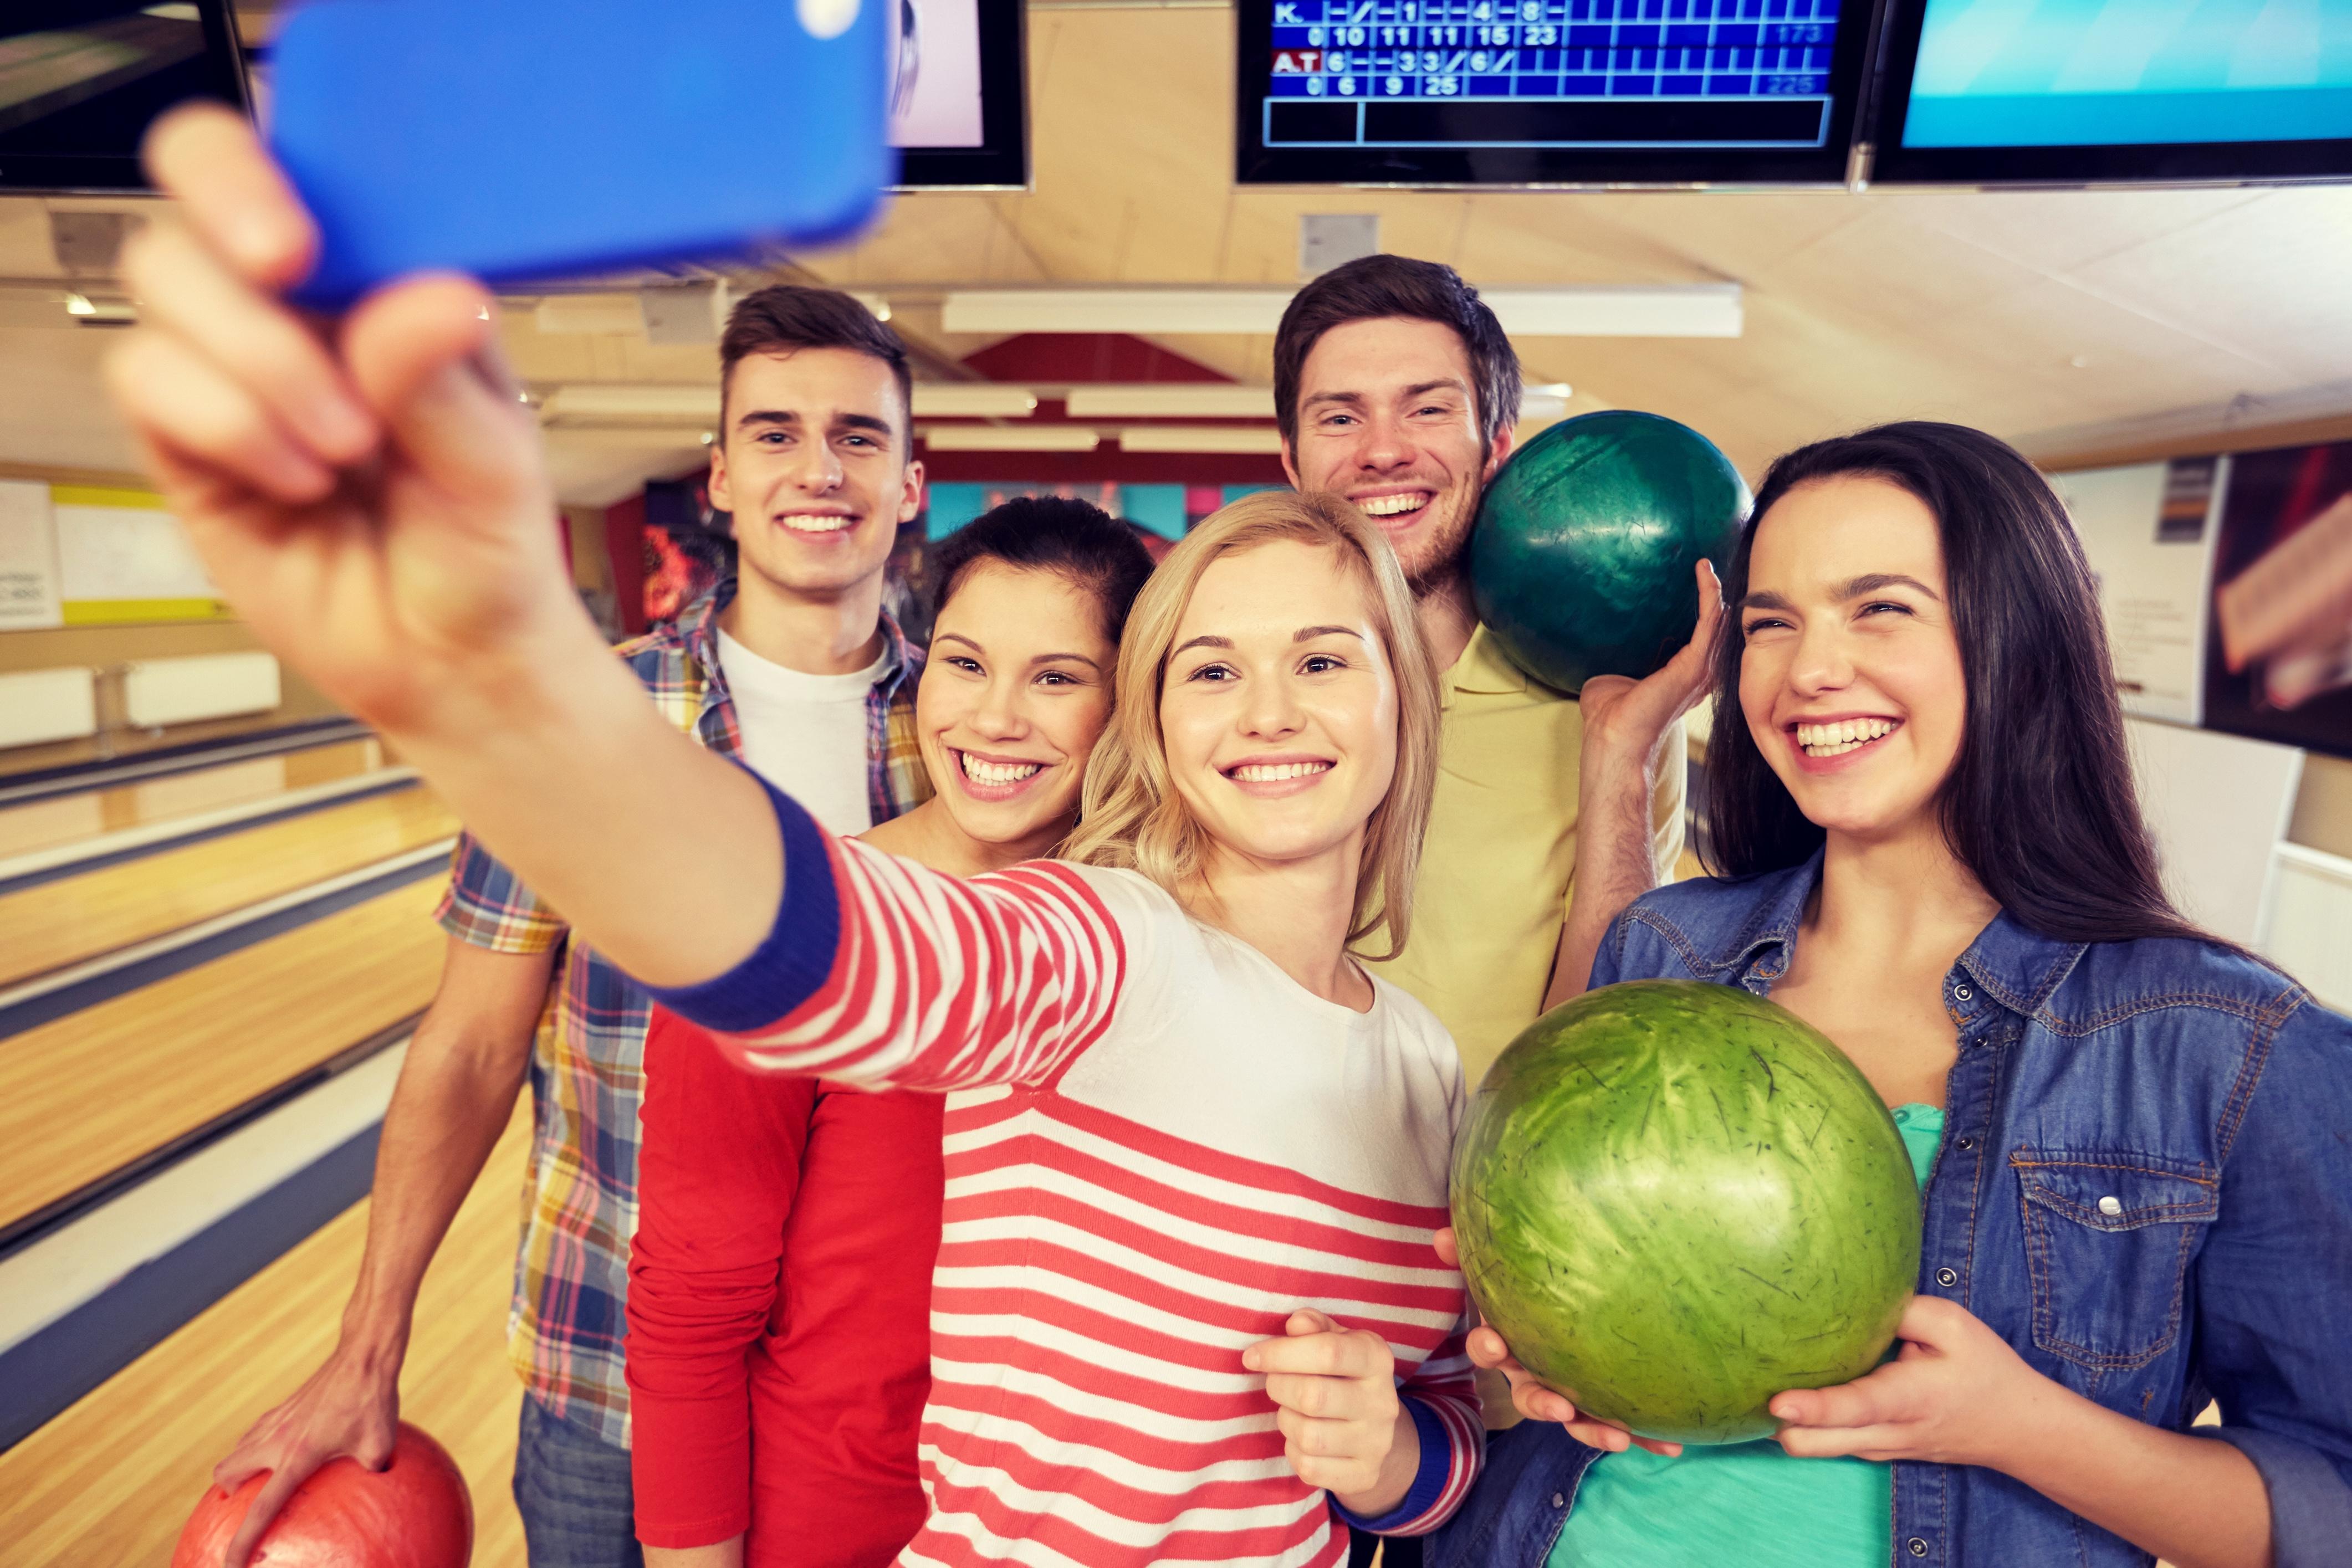 bowling selfie   bowling in a group   social bowling   open play bowling   open bowling   odyssey fun center   sheboygan, wi